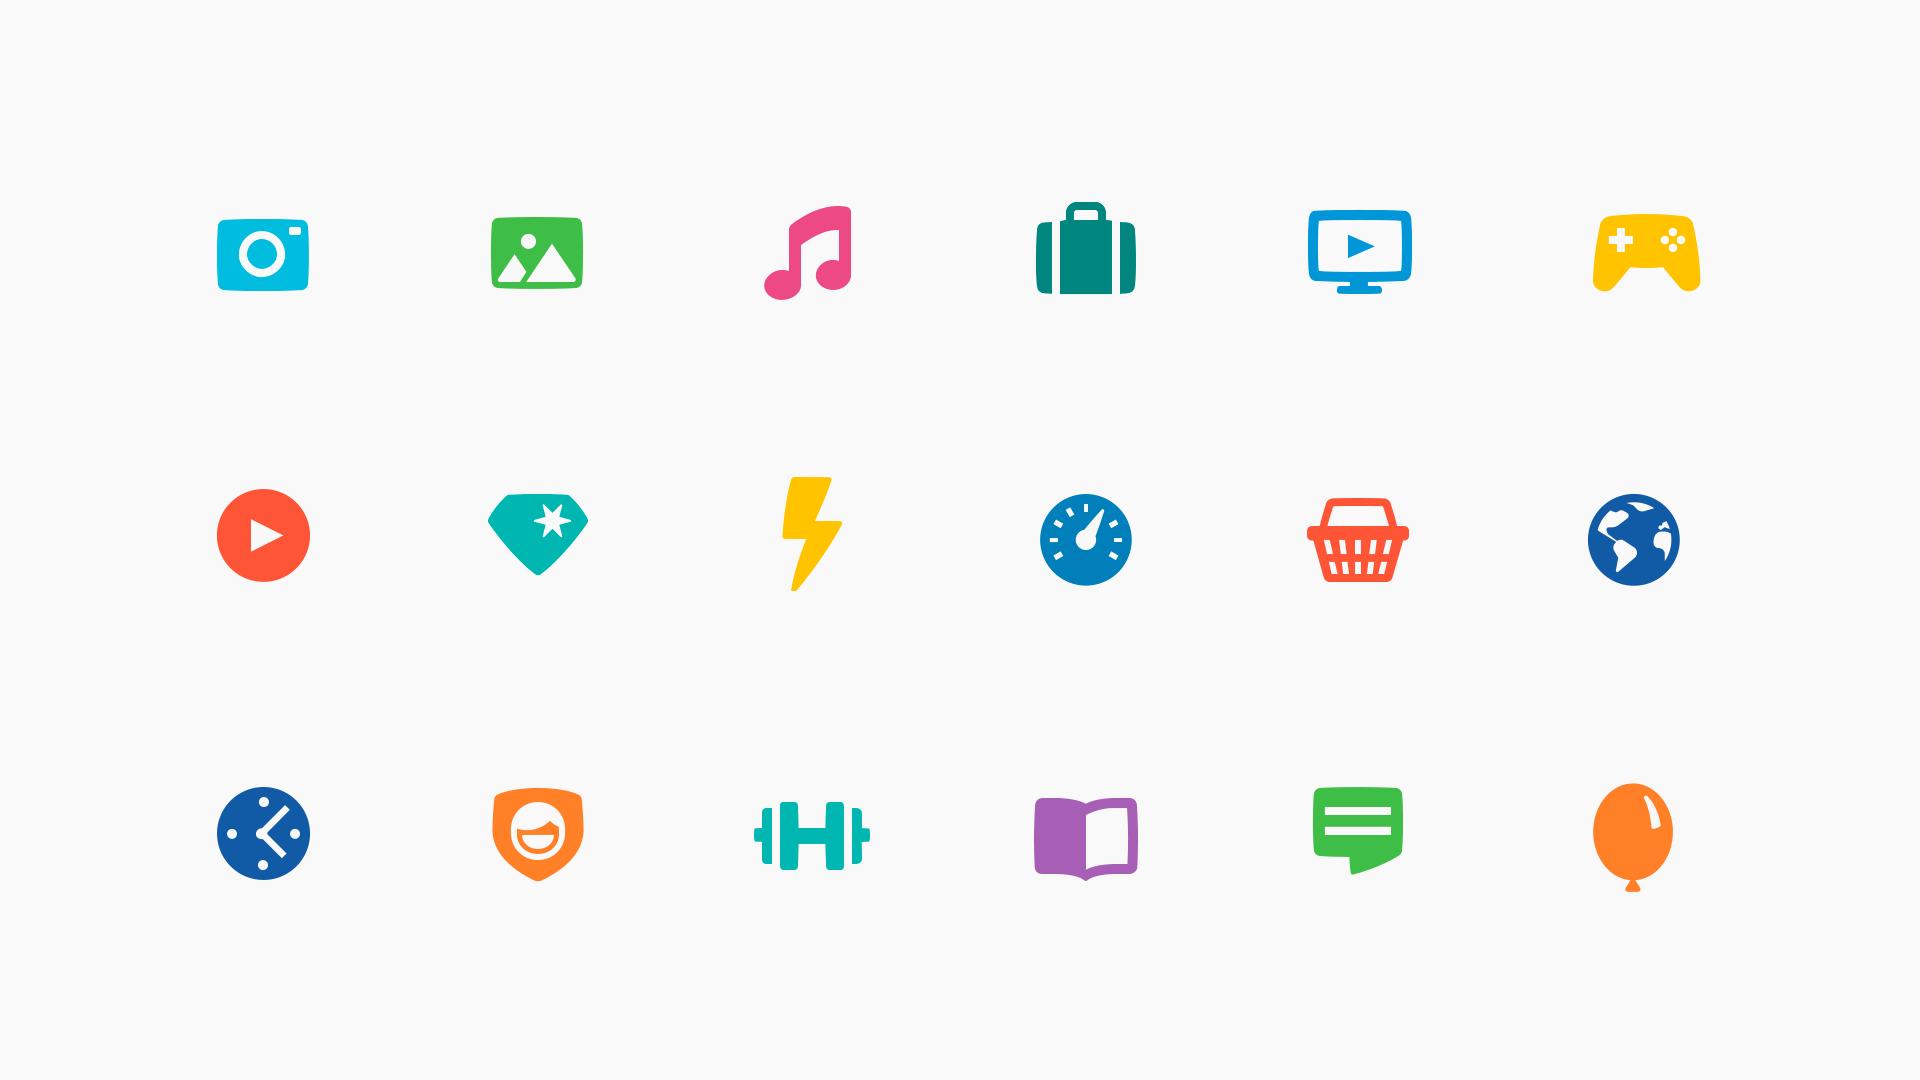 huld icons